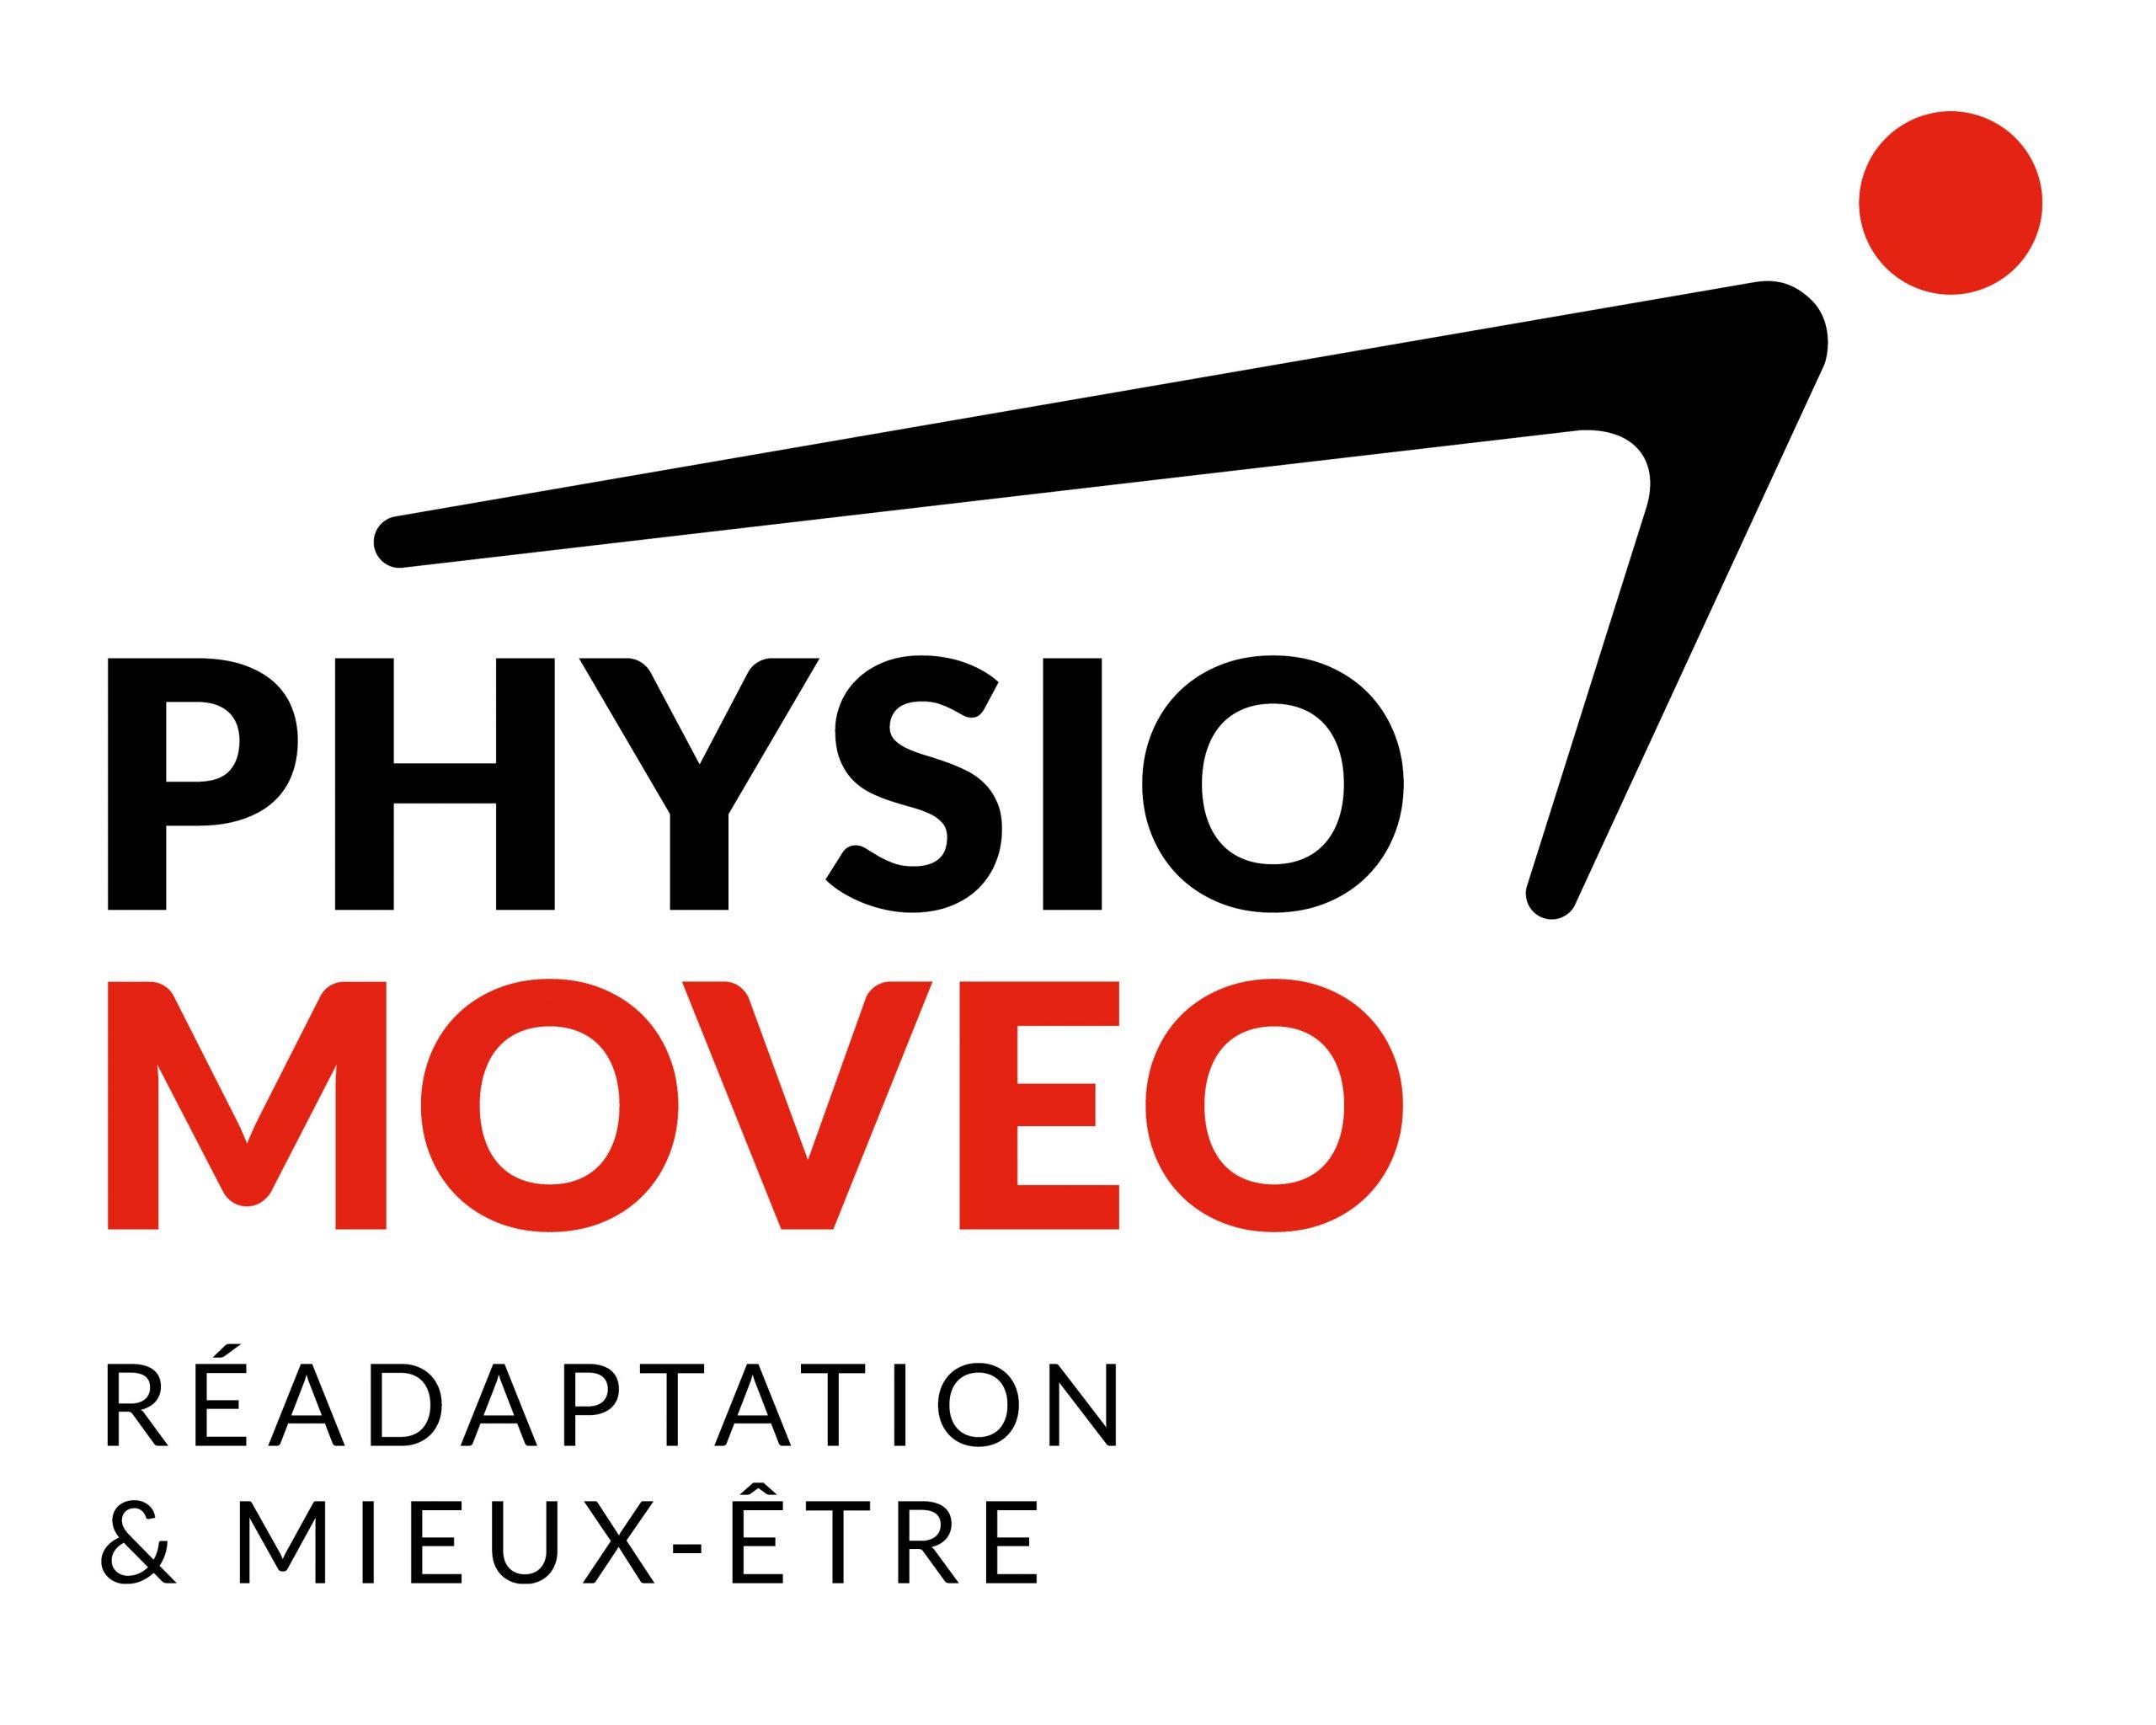 PhysioMoveo